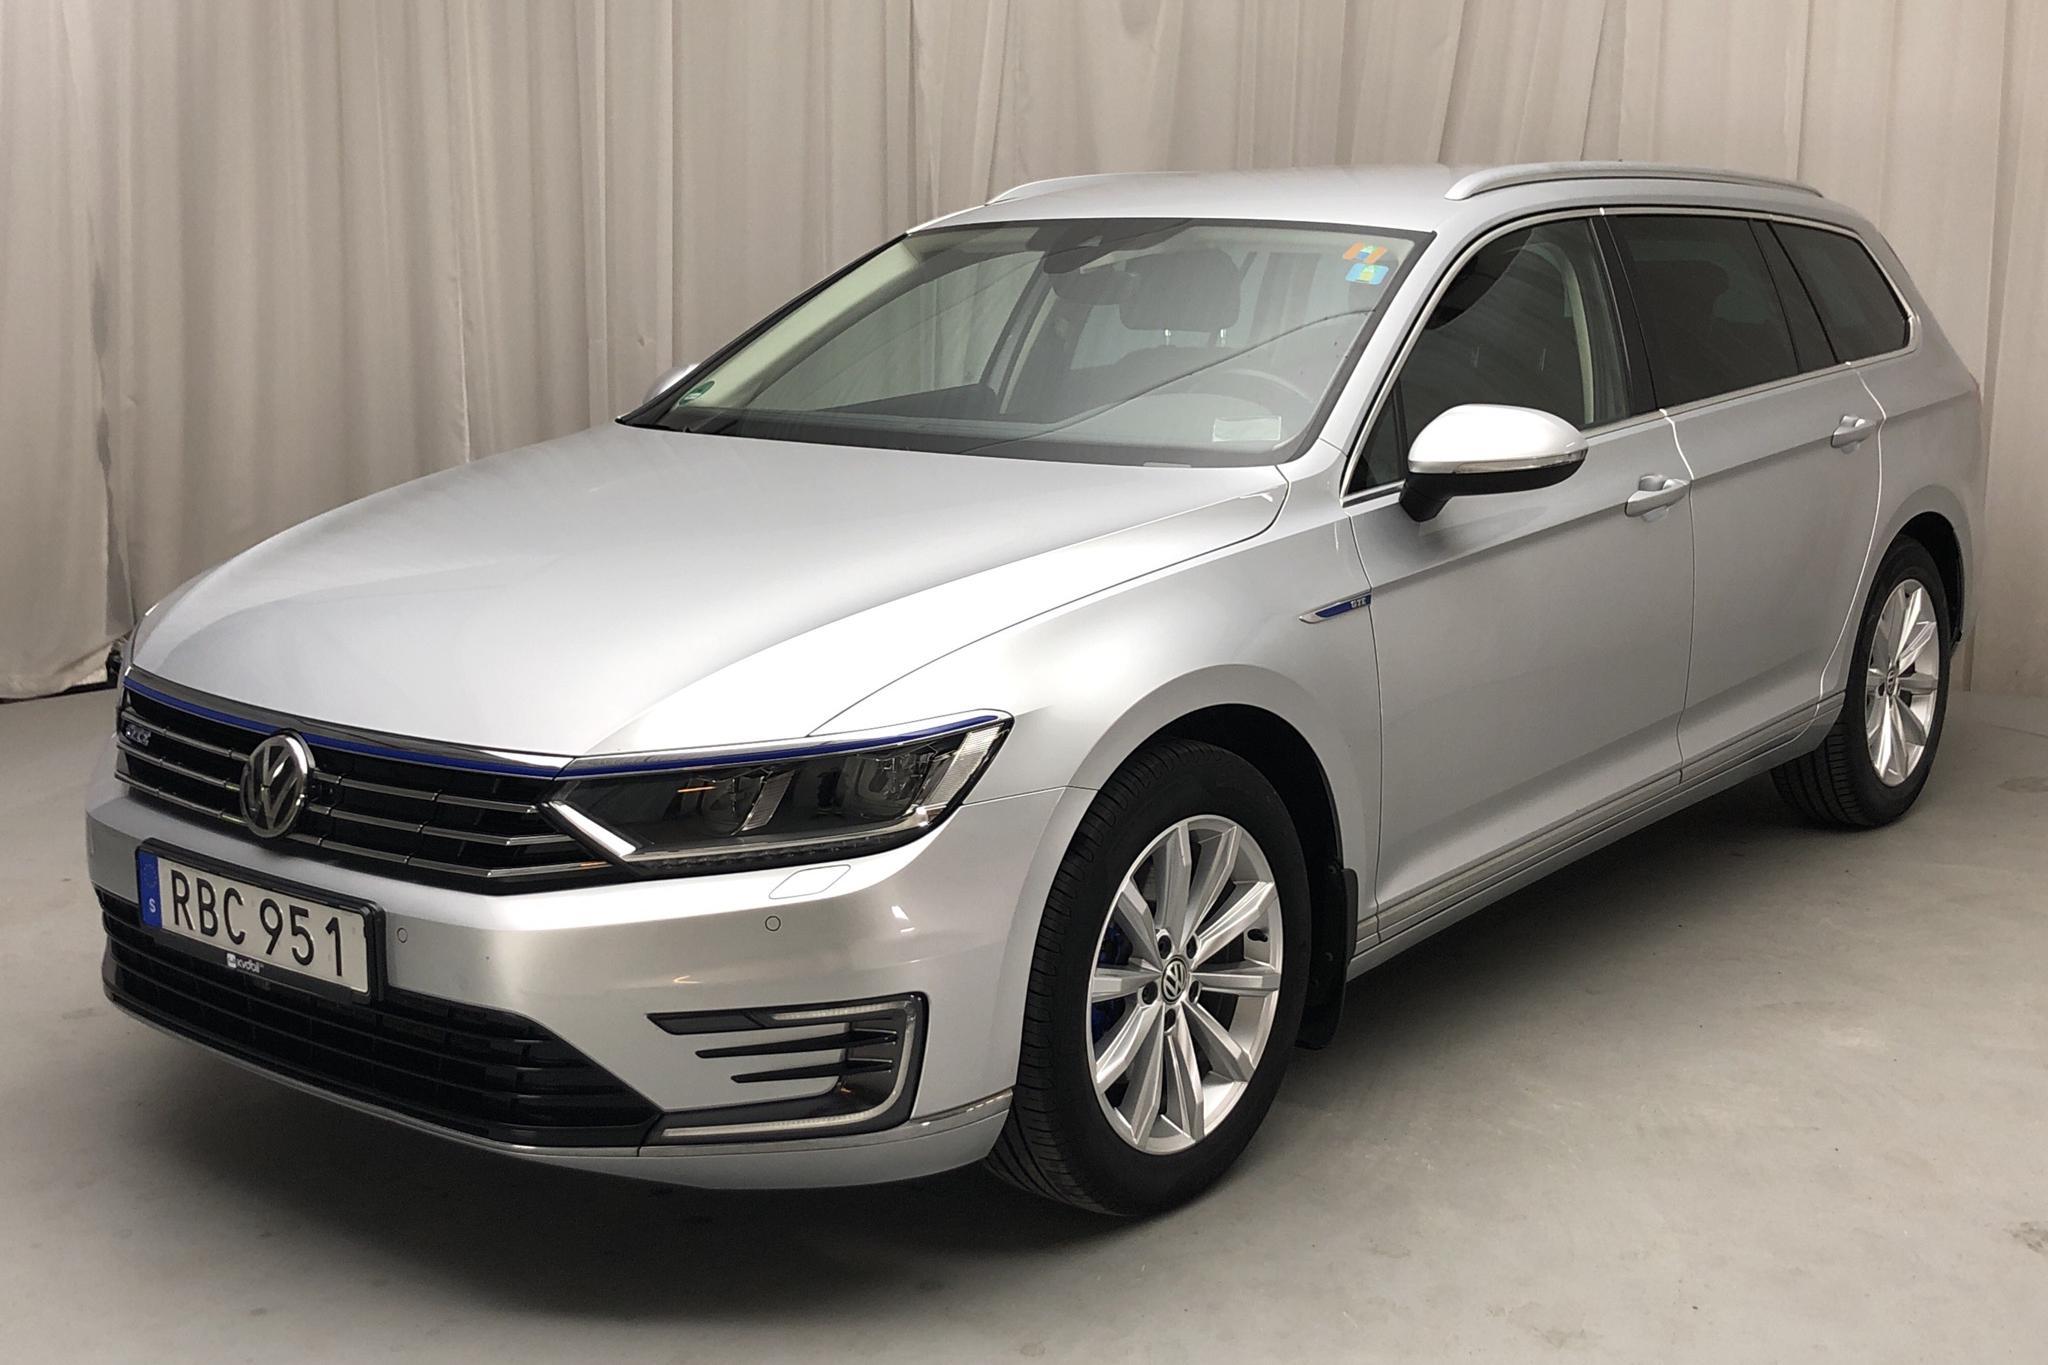 VW Passat 1.4 Plug-in-Hybrid Sportscombi (218hk) - 60 860 km - Automatic - silver - 2017